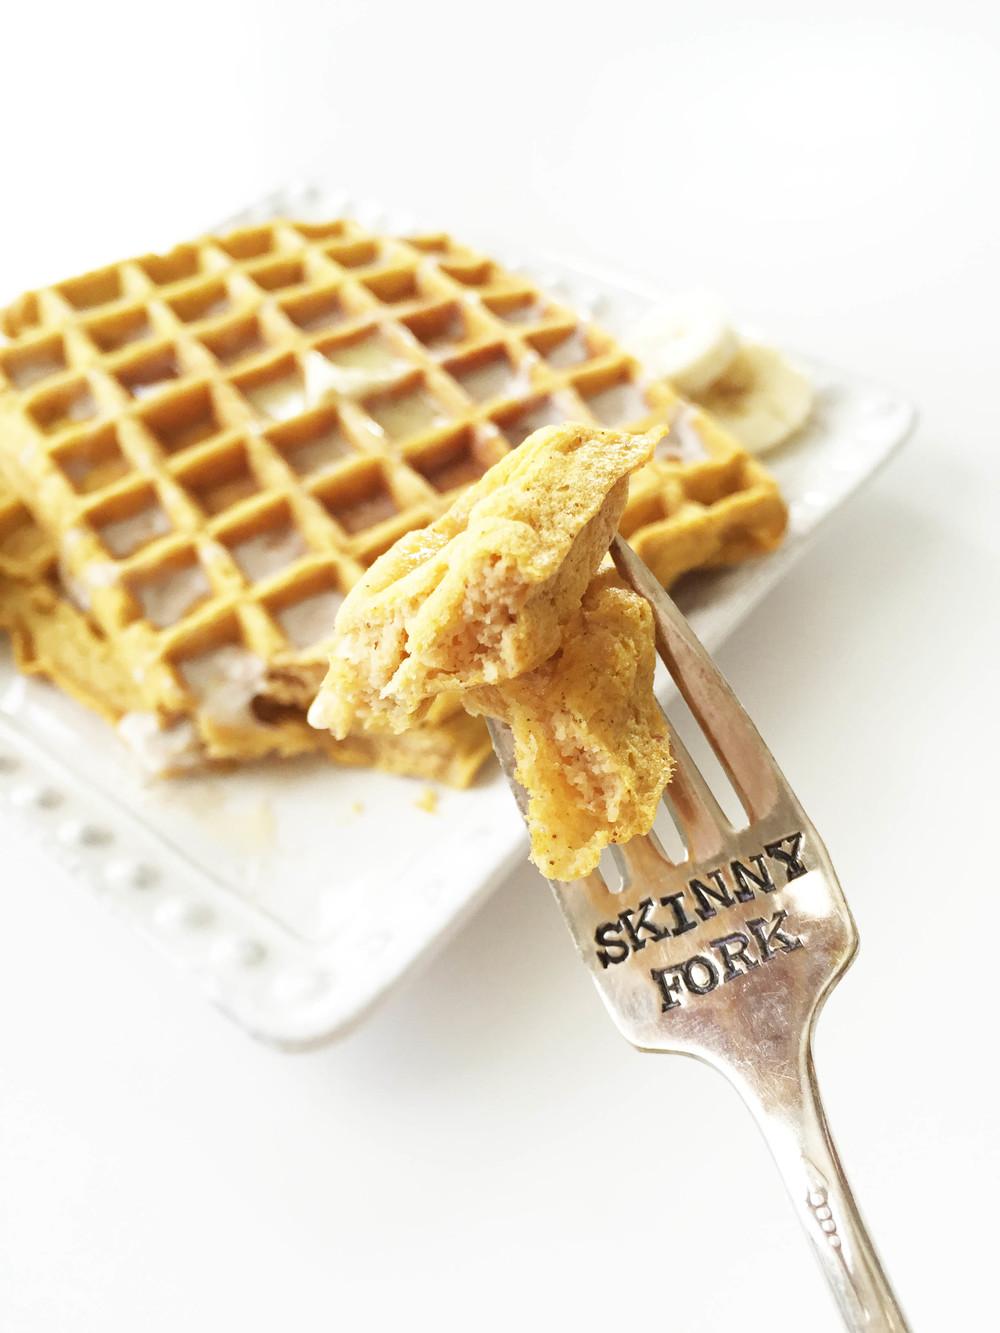 Whole Wheat Pumpkin Pie Spice Waffles (Sponsored) — The Skinny Fork